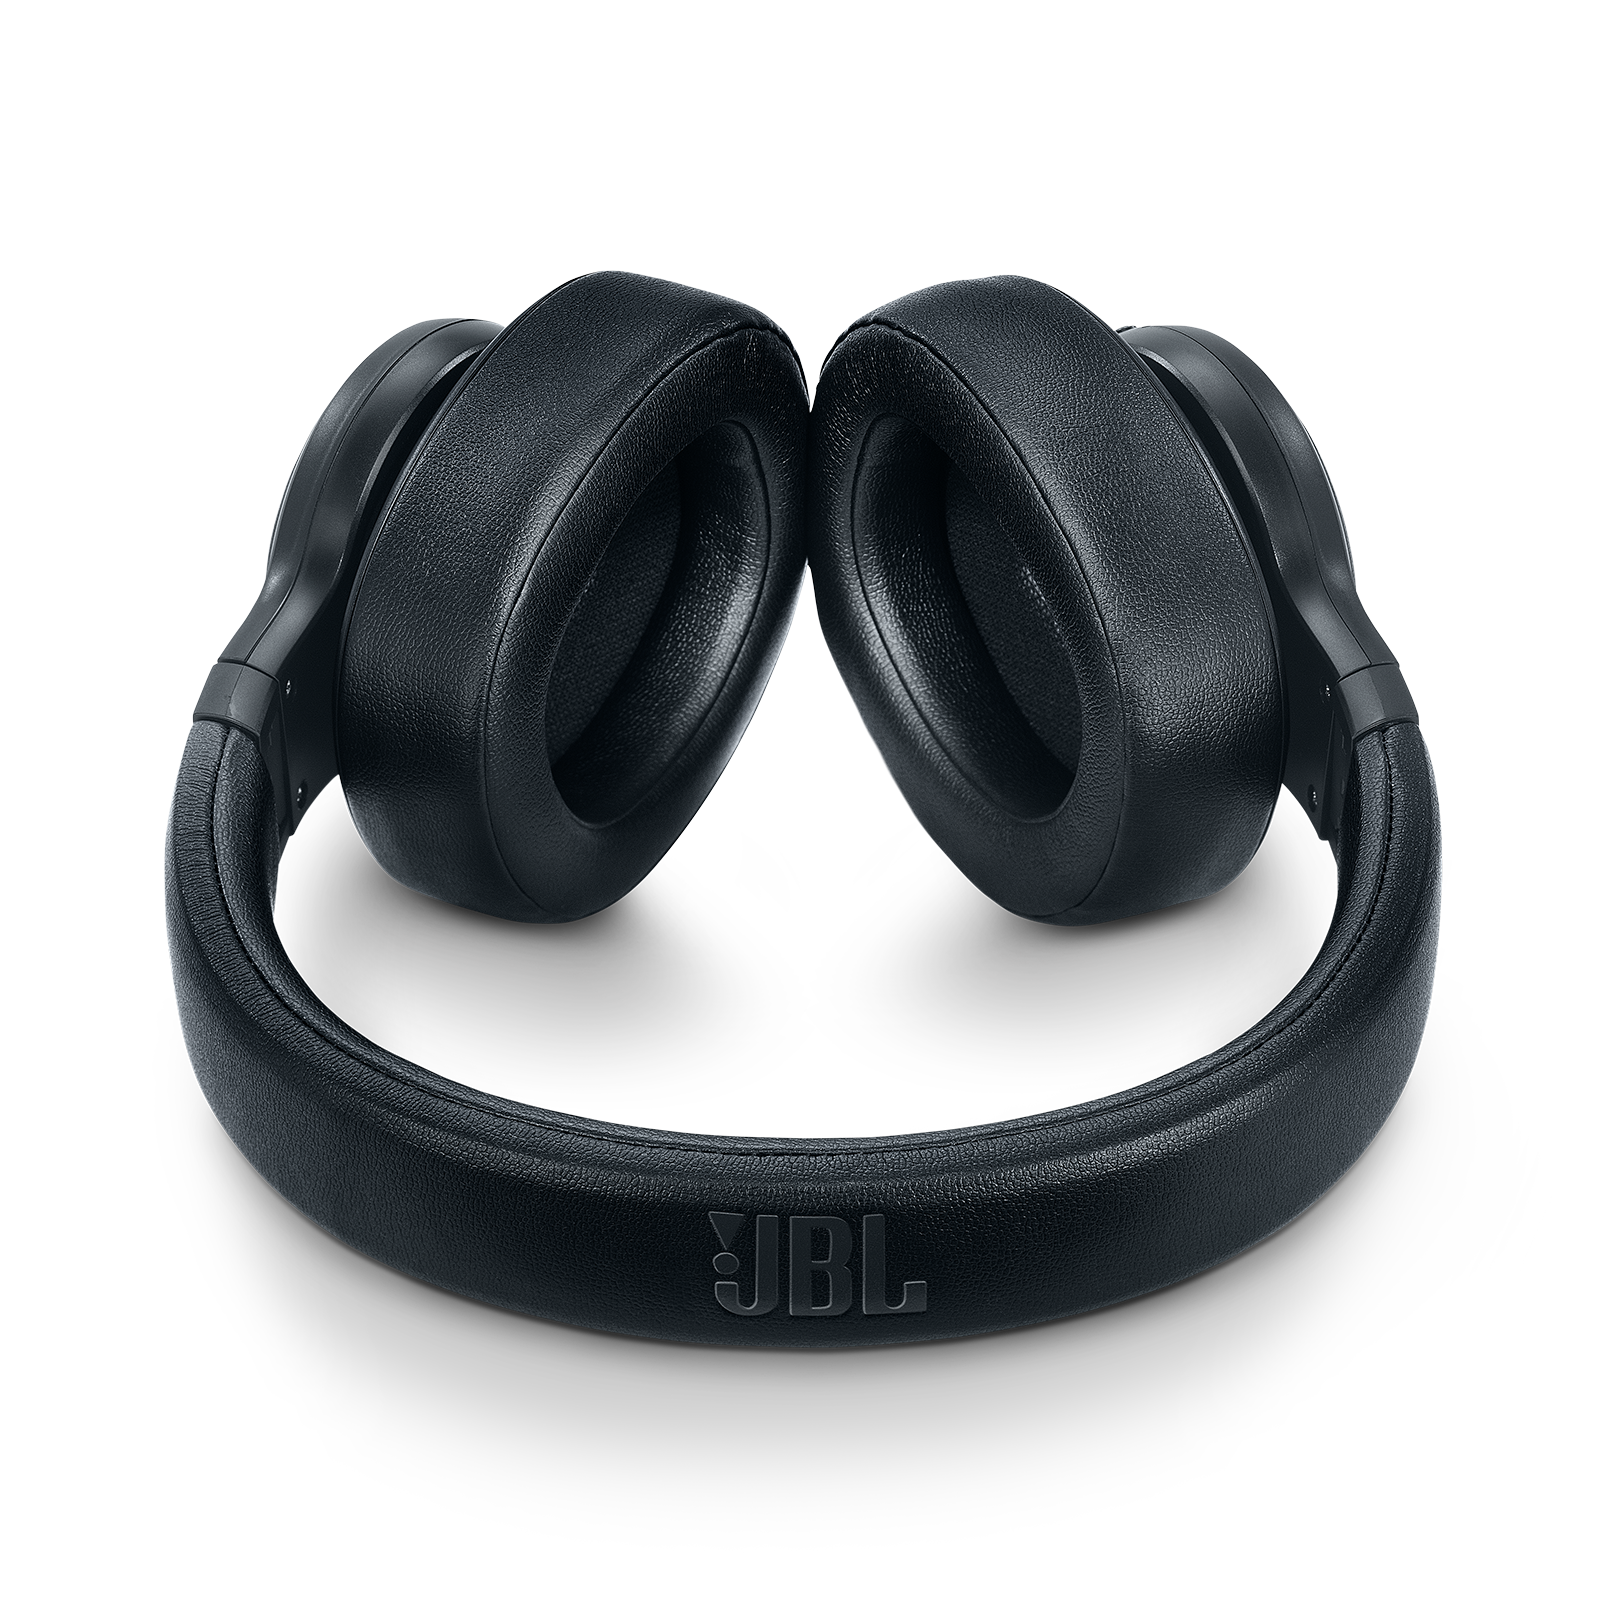 e35d3217c4a JBL Duet NC | Wireless over-ear noise-cancelling headphones